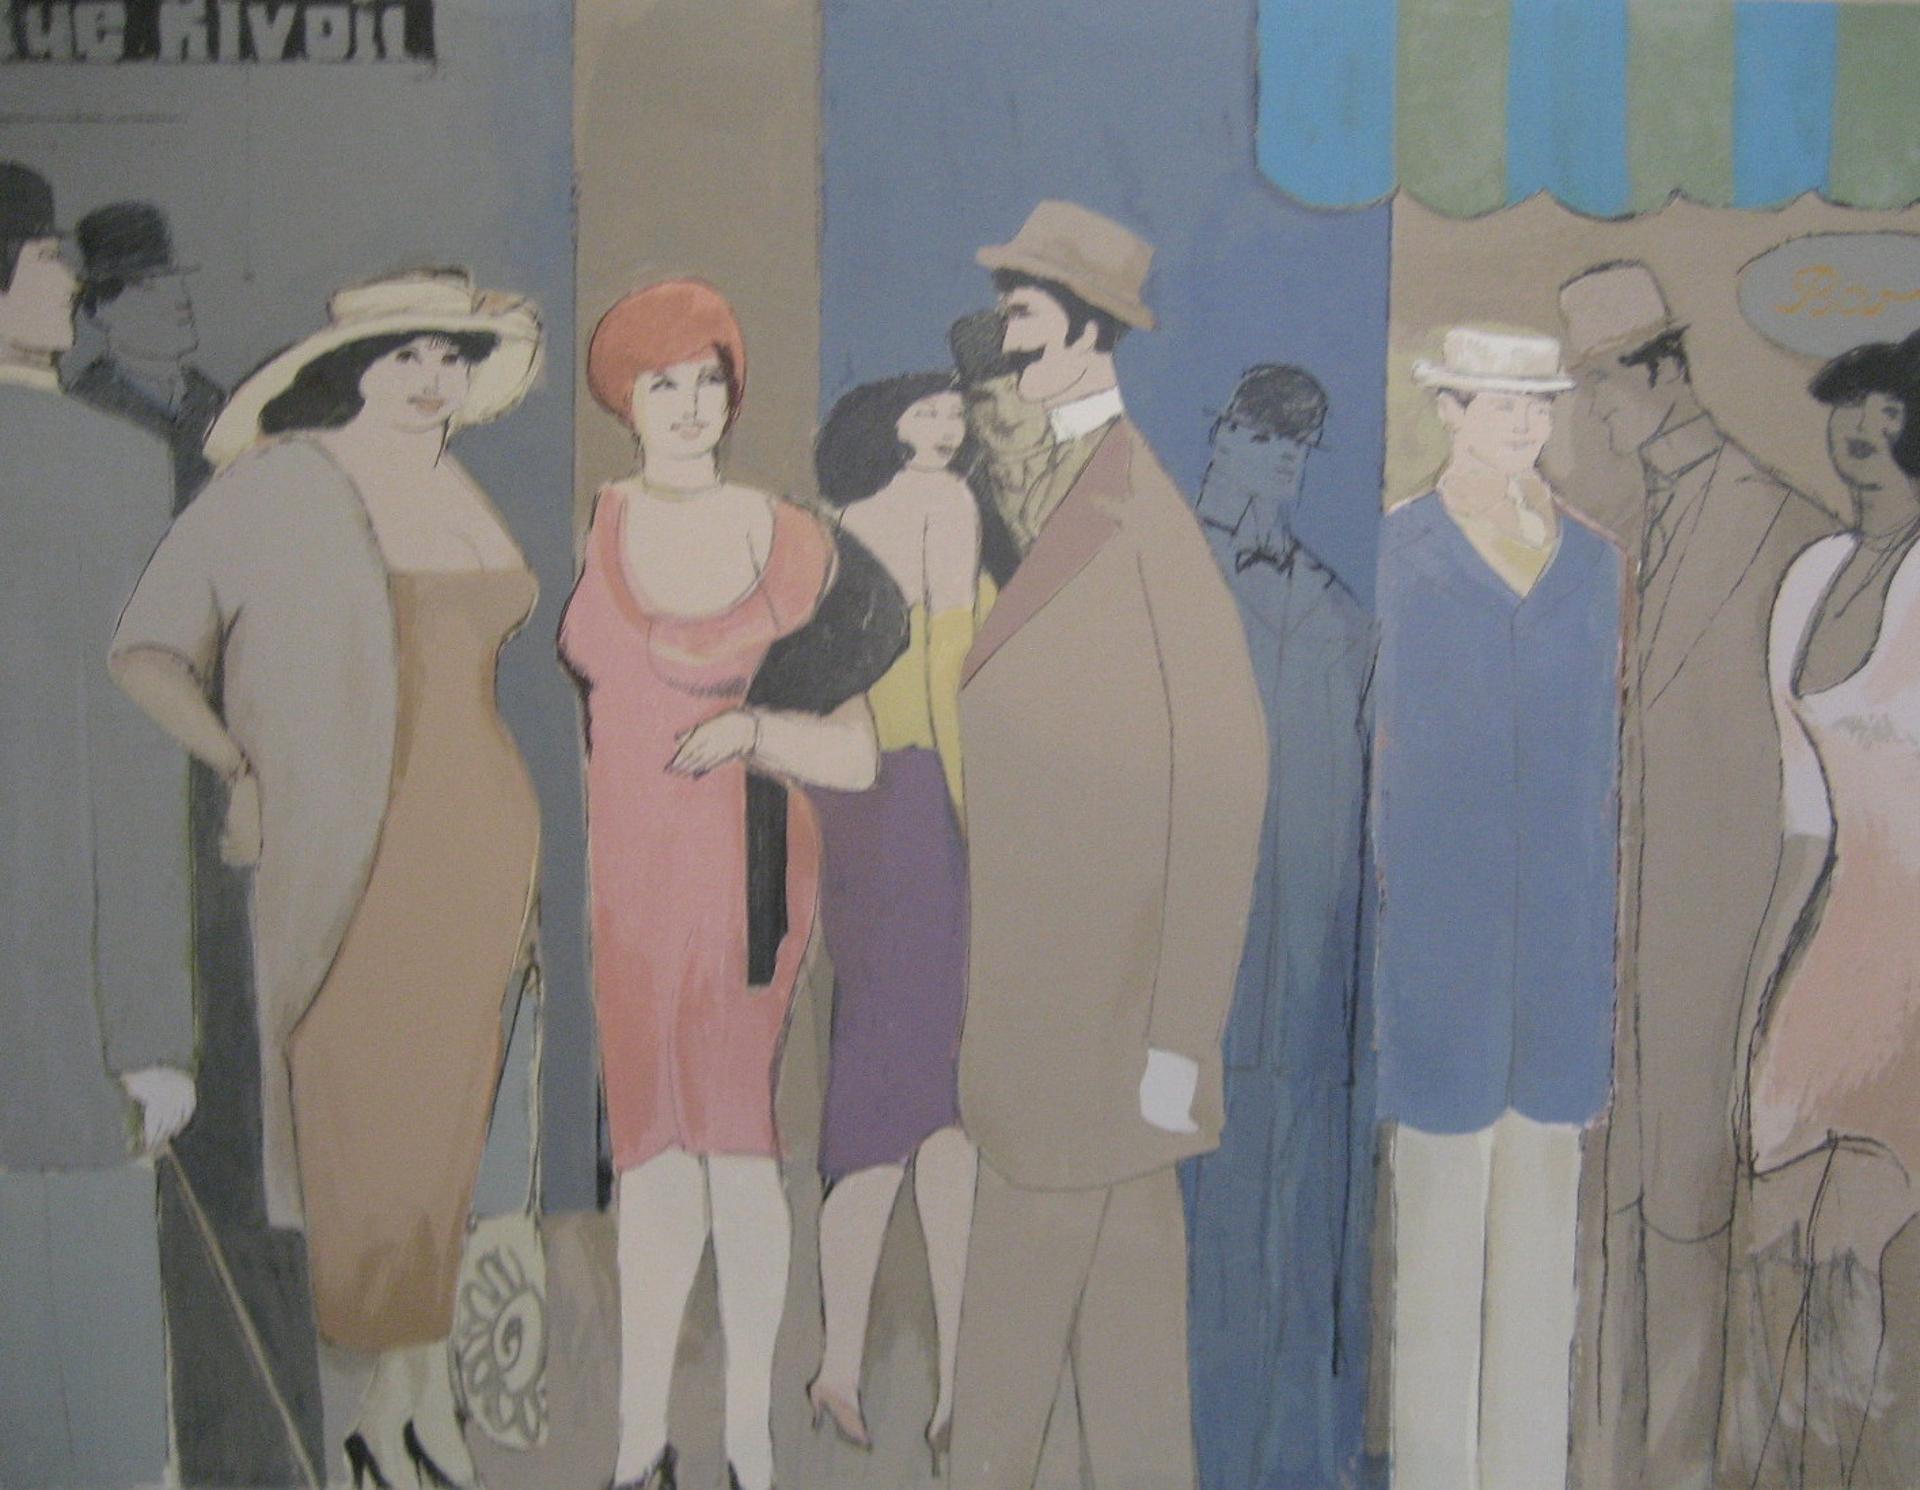 Rue Rivoli by David Schneuer